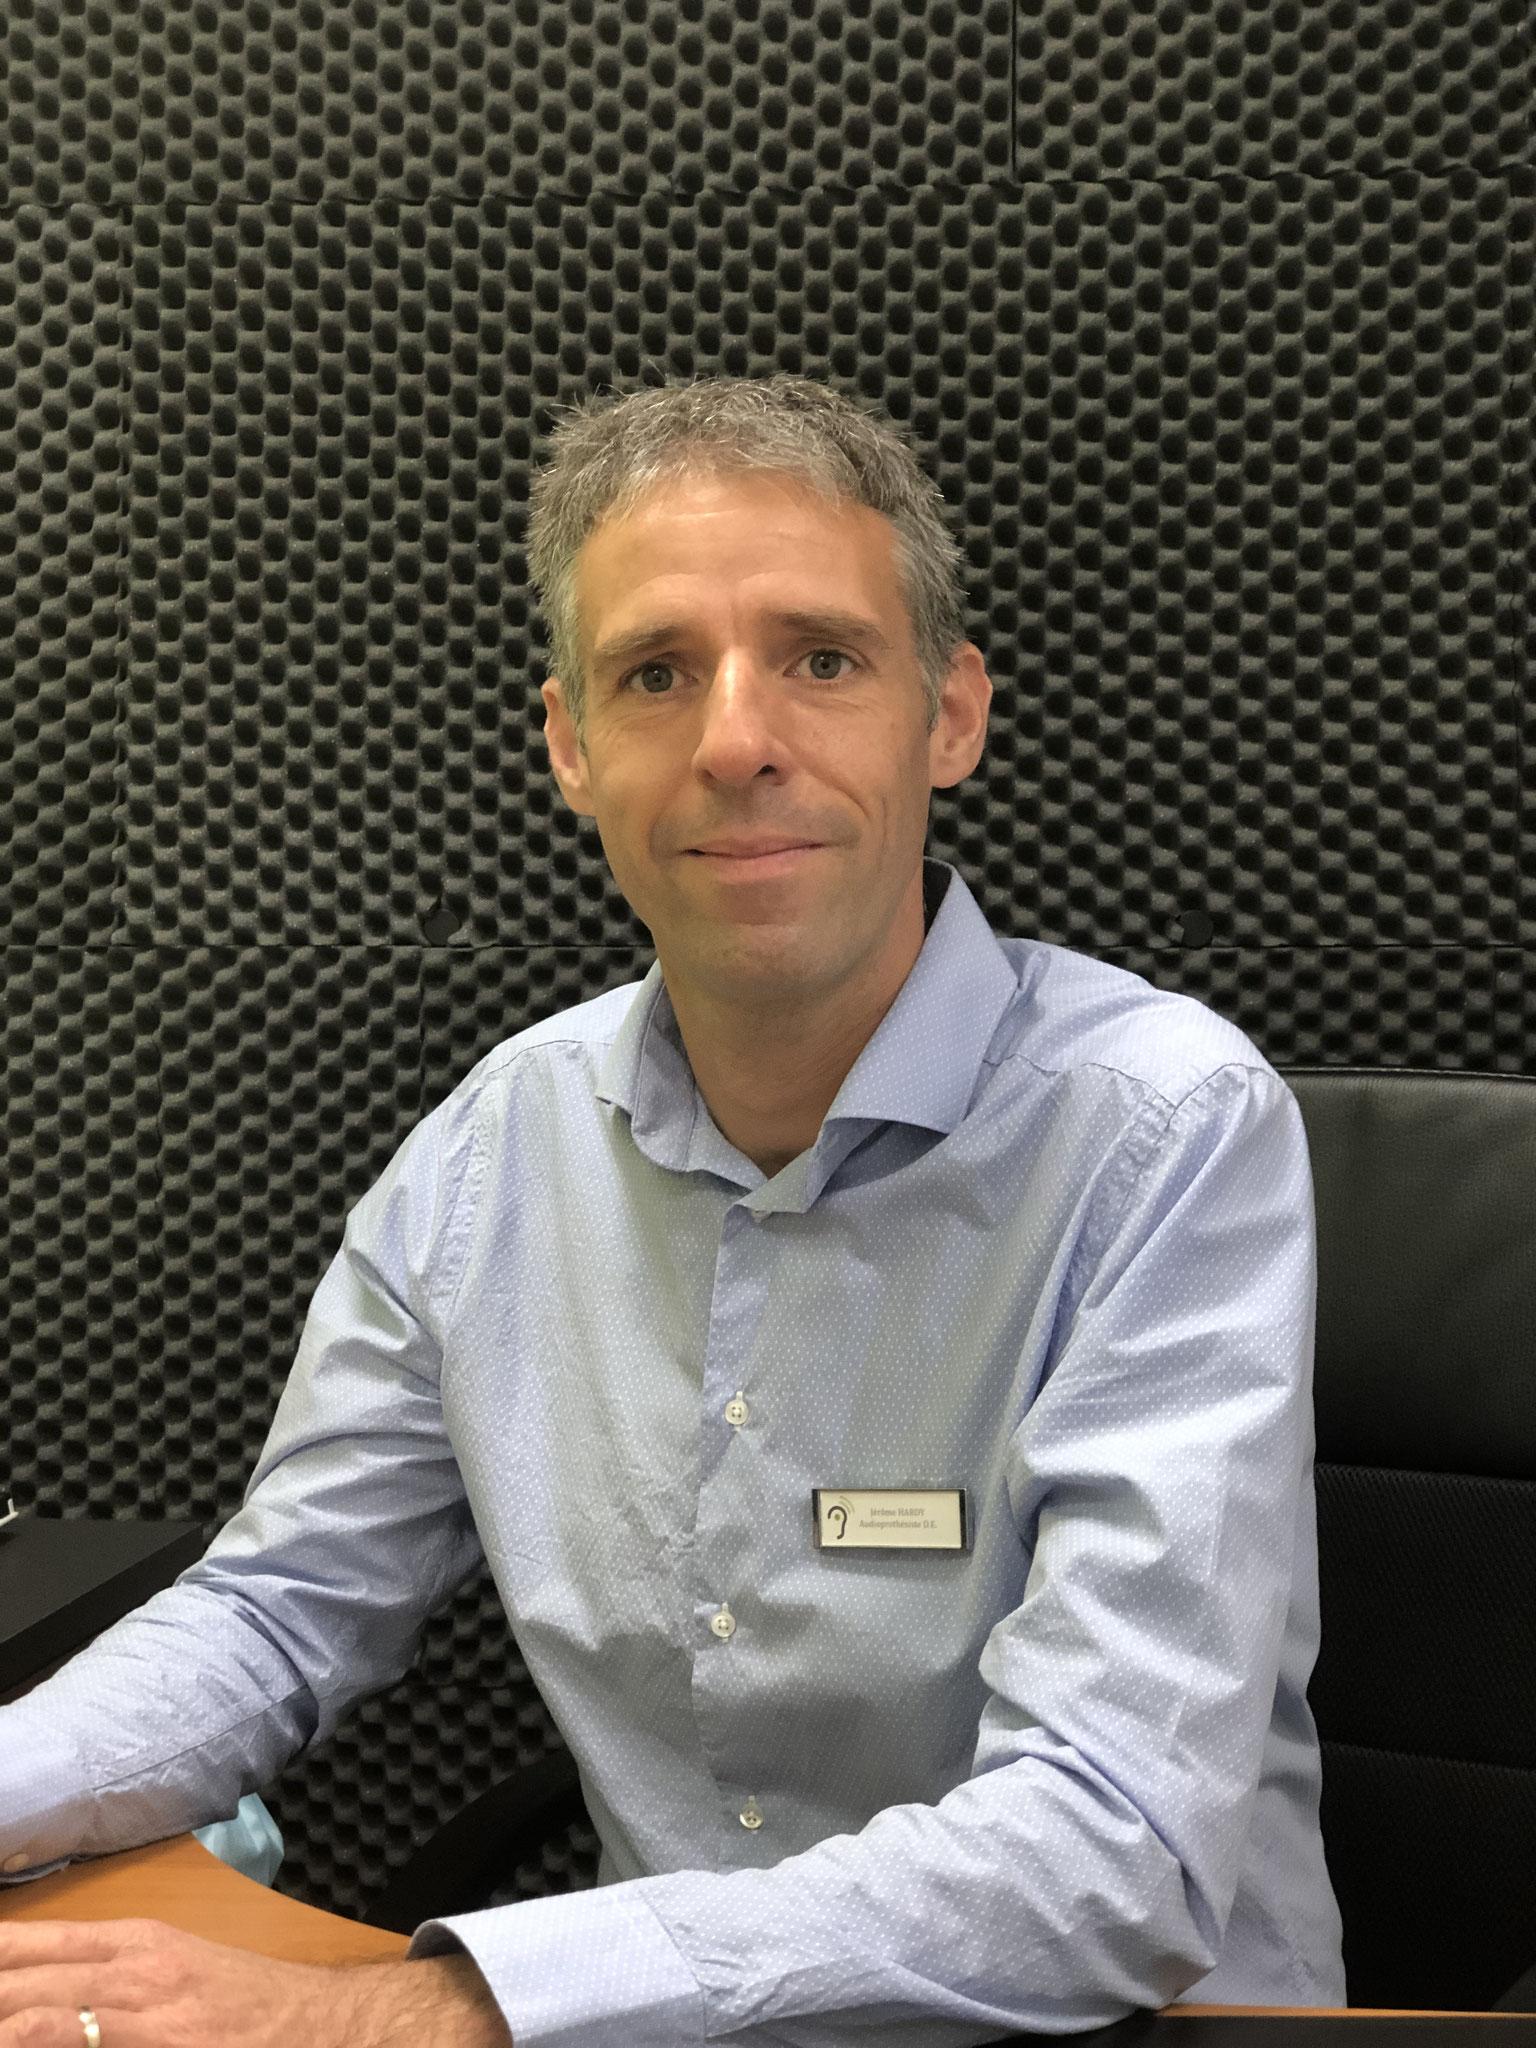 Jérôme HARDY - Audioprothésiste à St-Nazaire